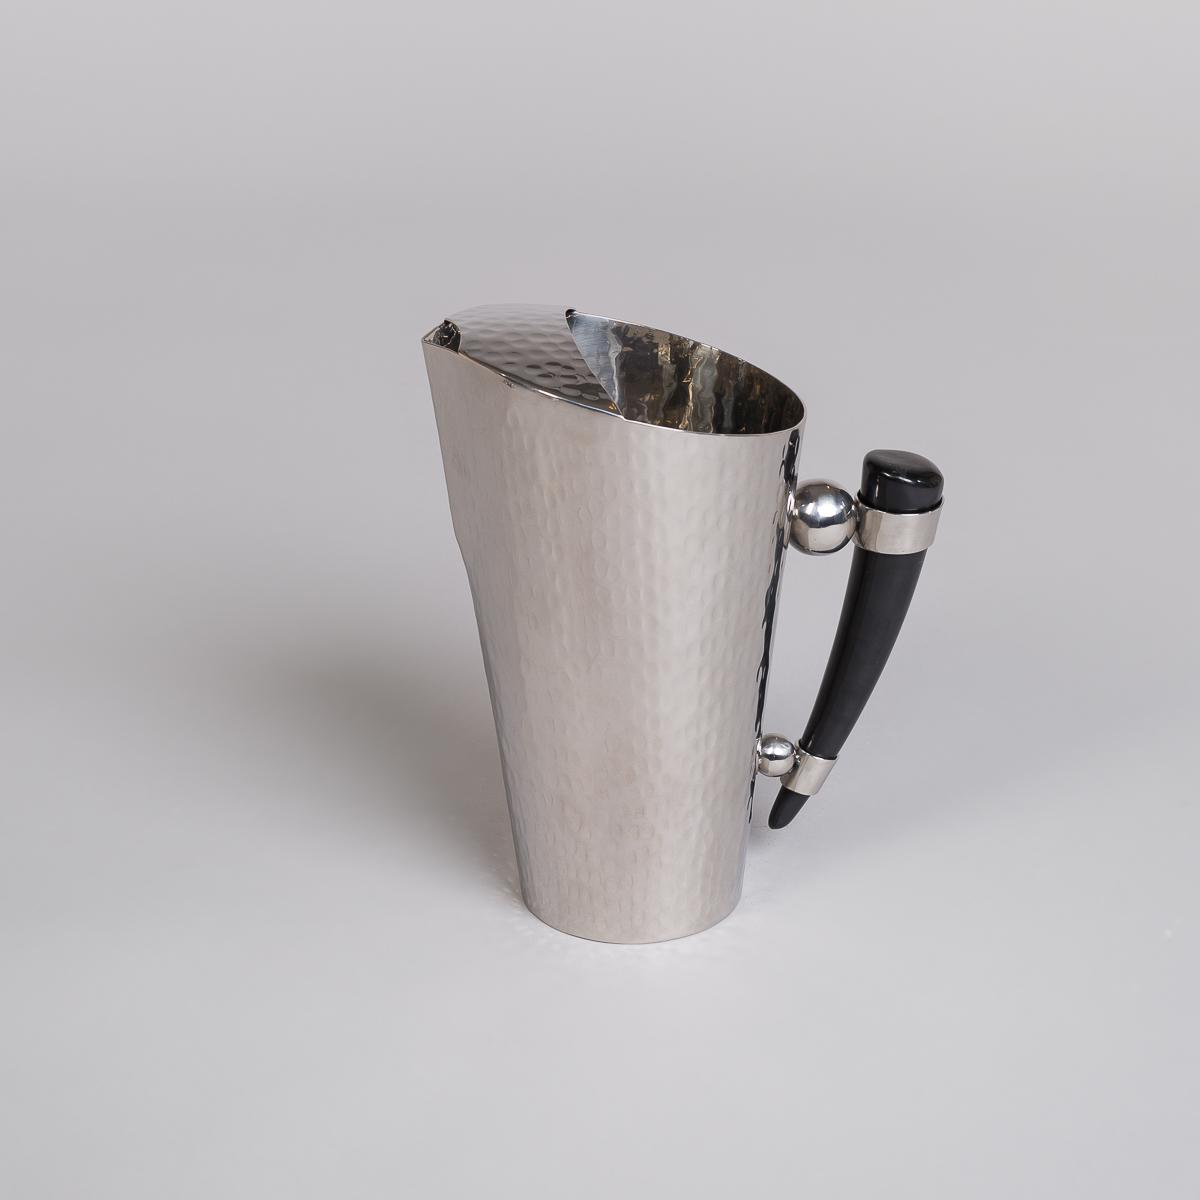 Mugge i rustfritt stål med håndtak i bøffelhorn-0